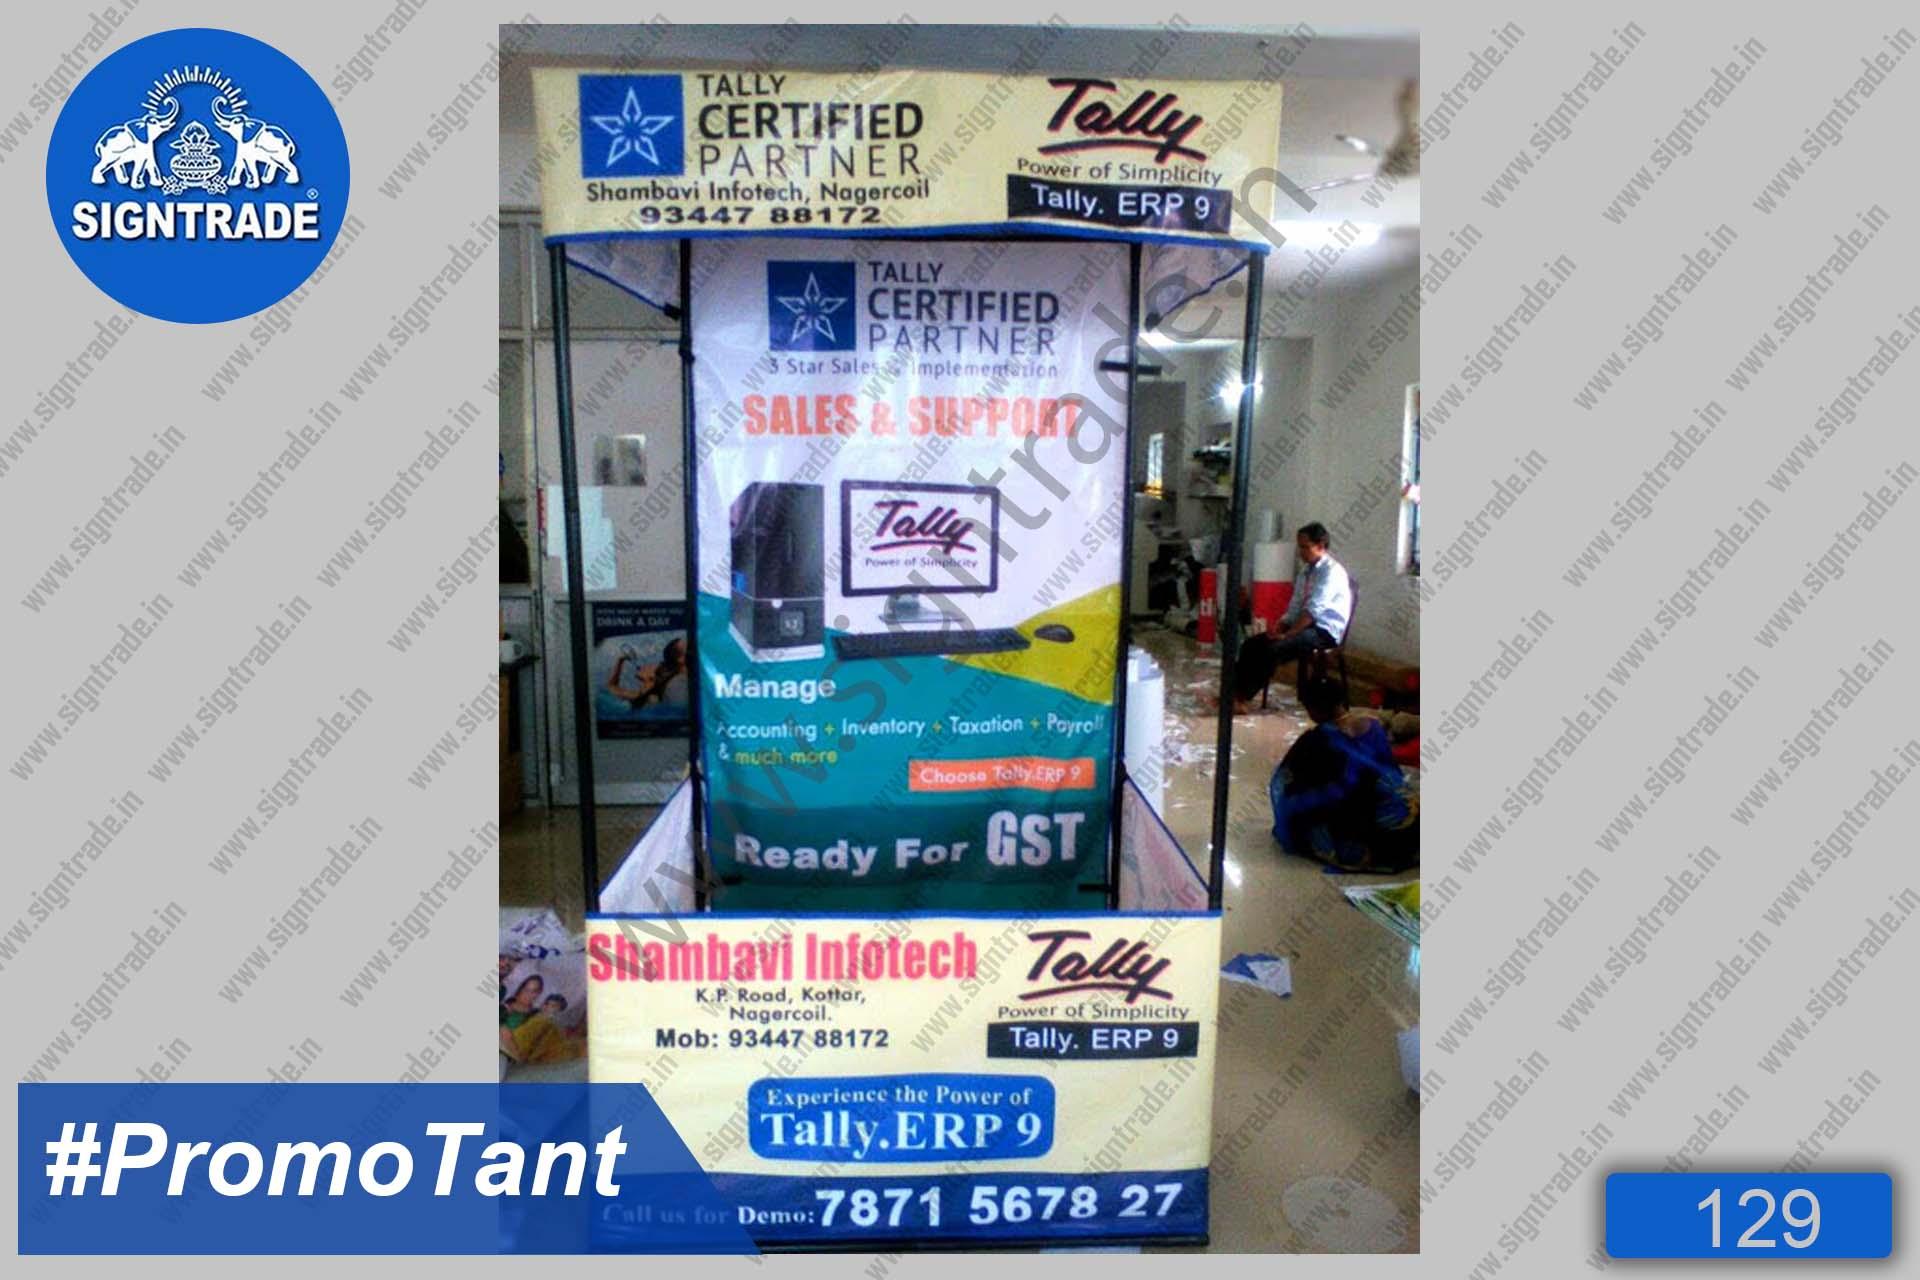 Shambhavi Infotech - Canopy Tent, Flat Roof Tent